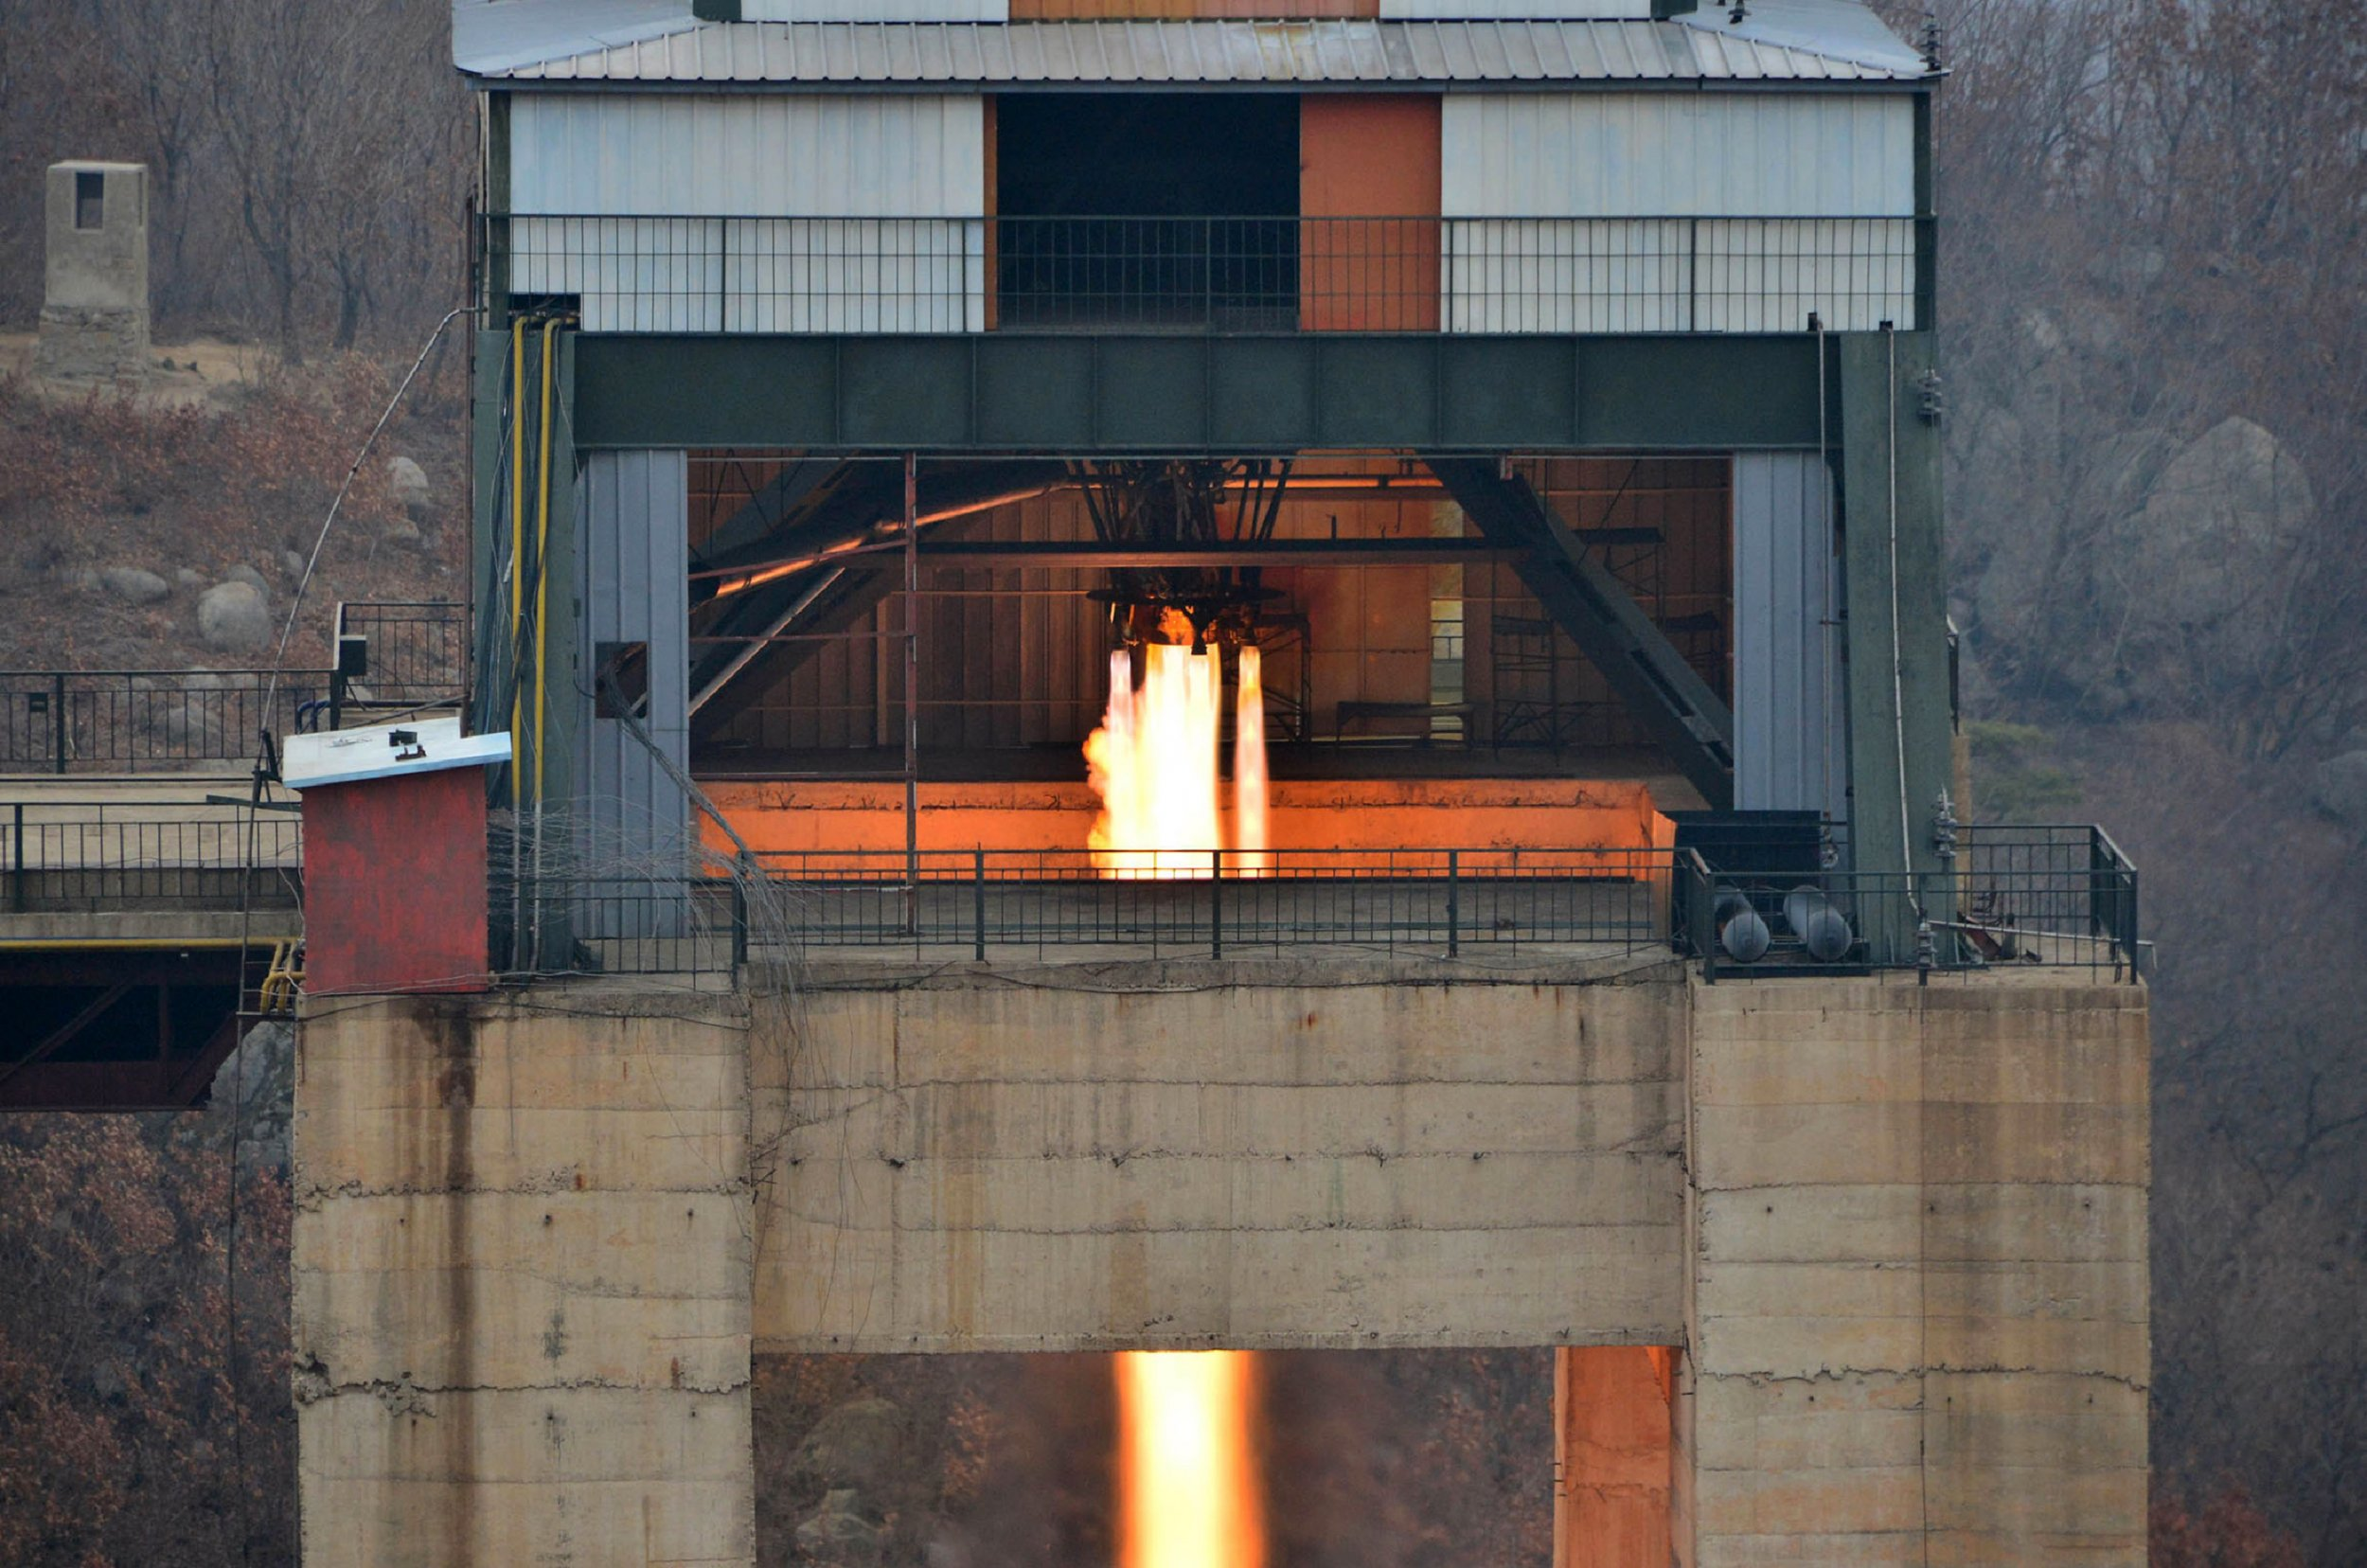 01_05_North_Korea_rocket_engine